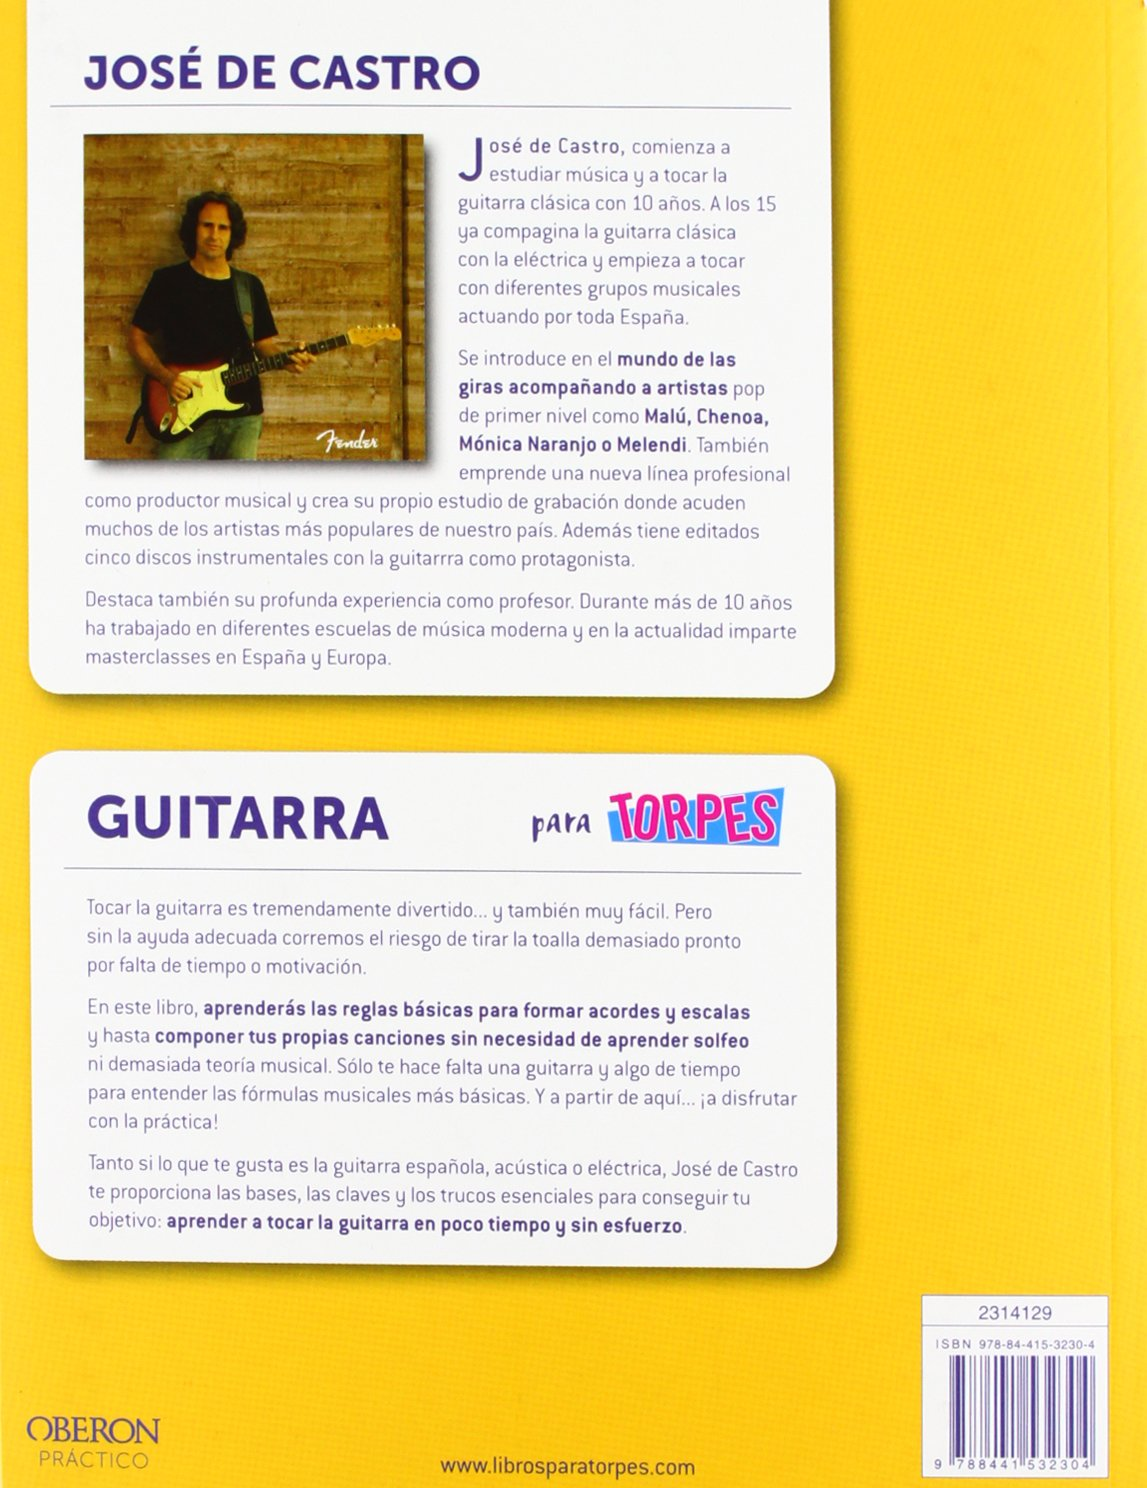 Guitarra: José Luis de Castro Martín: 9788441532304: Amazon.com: Books